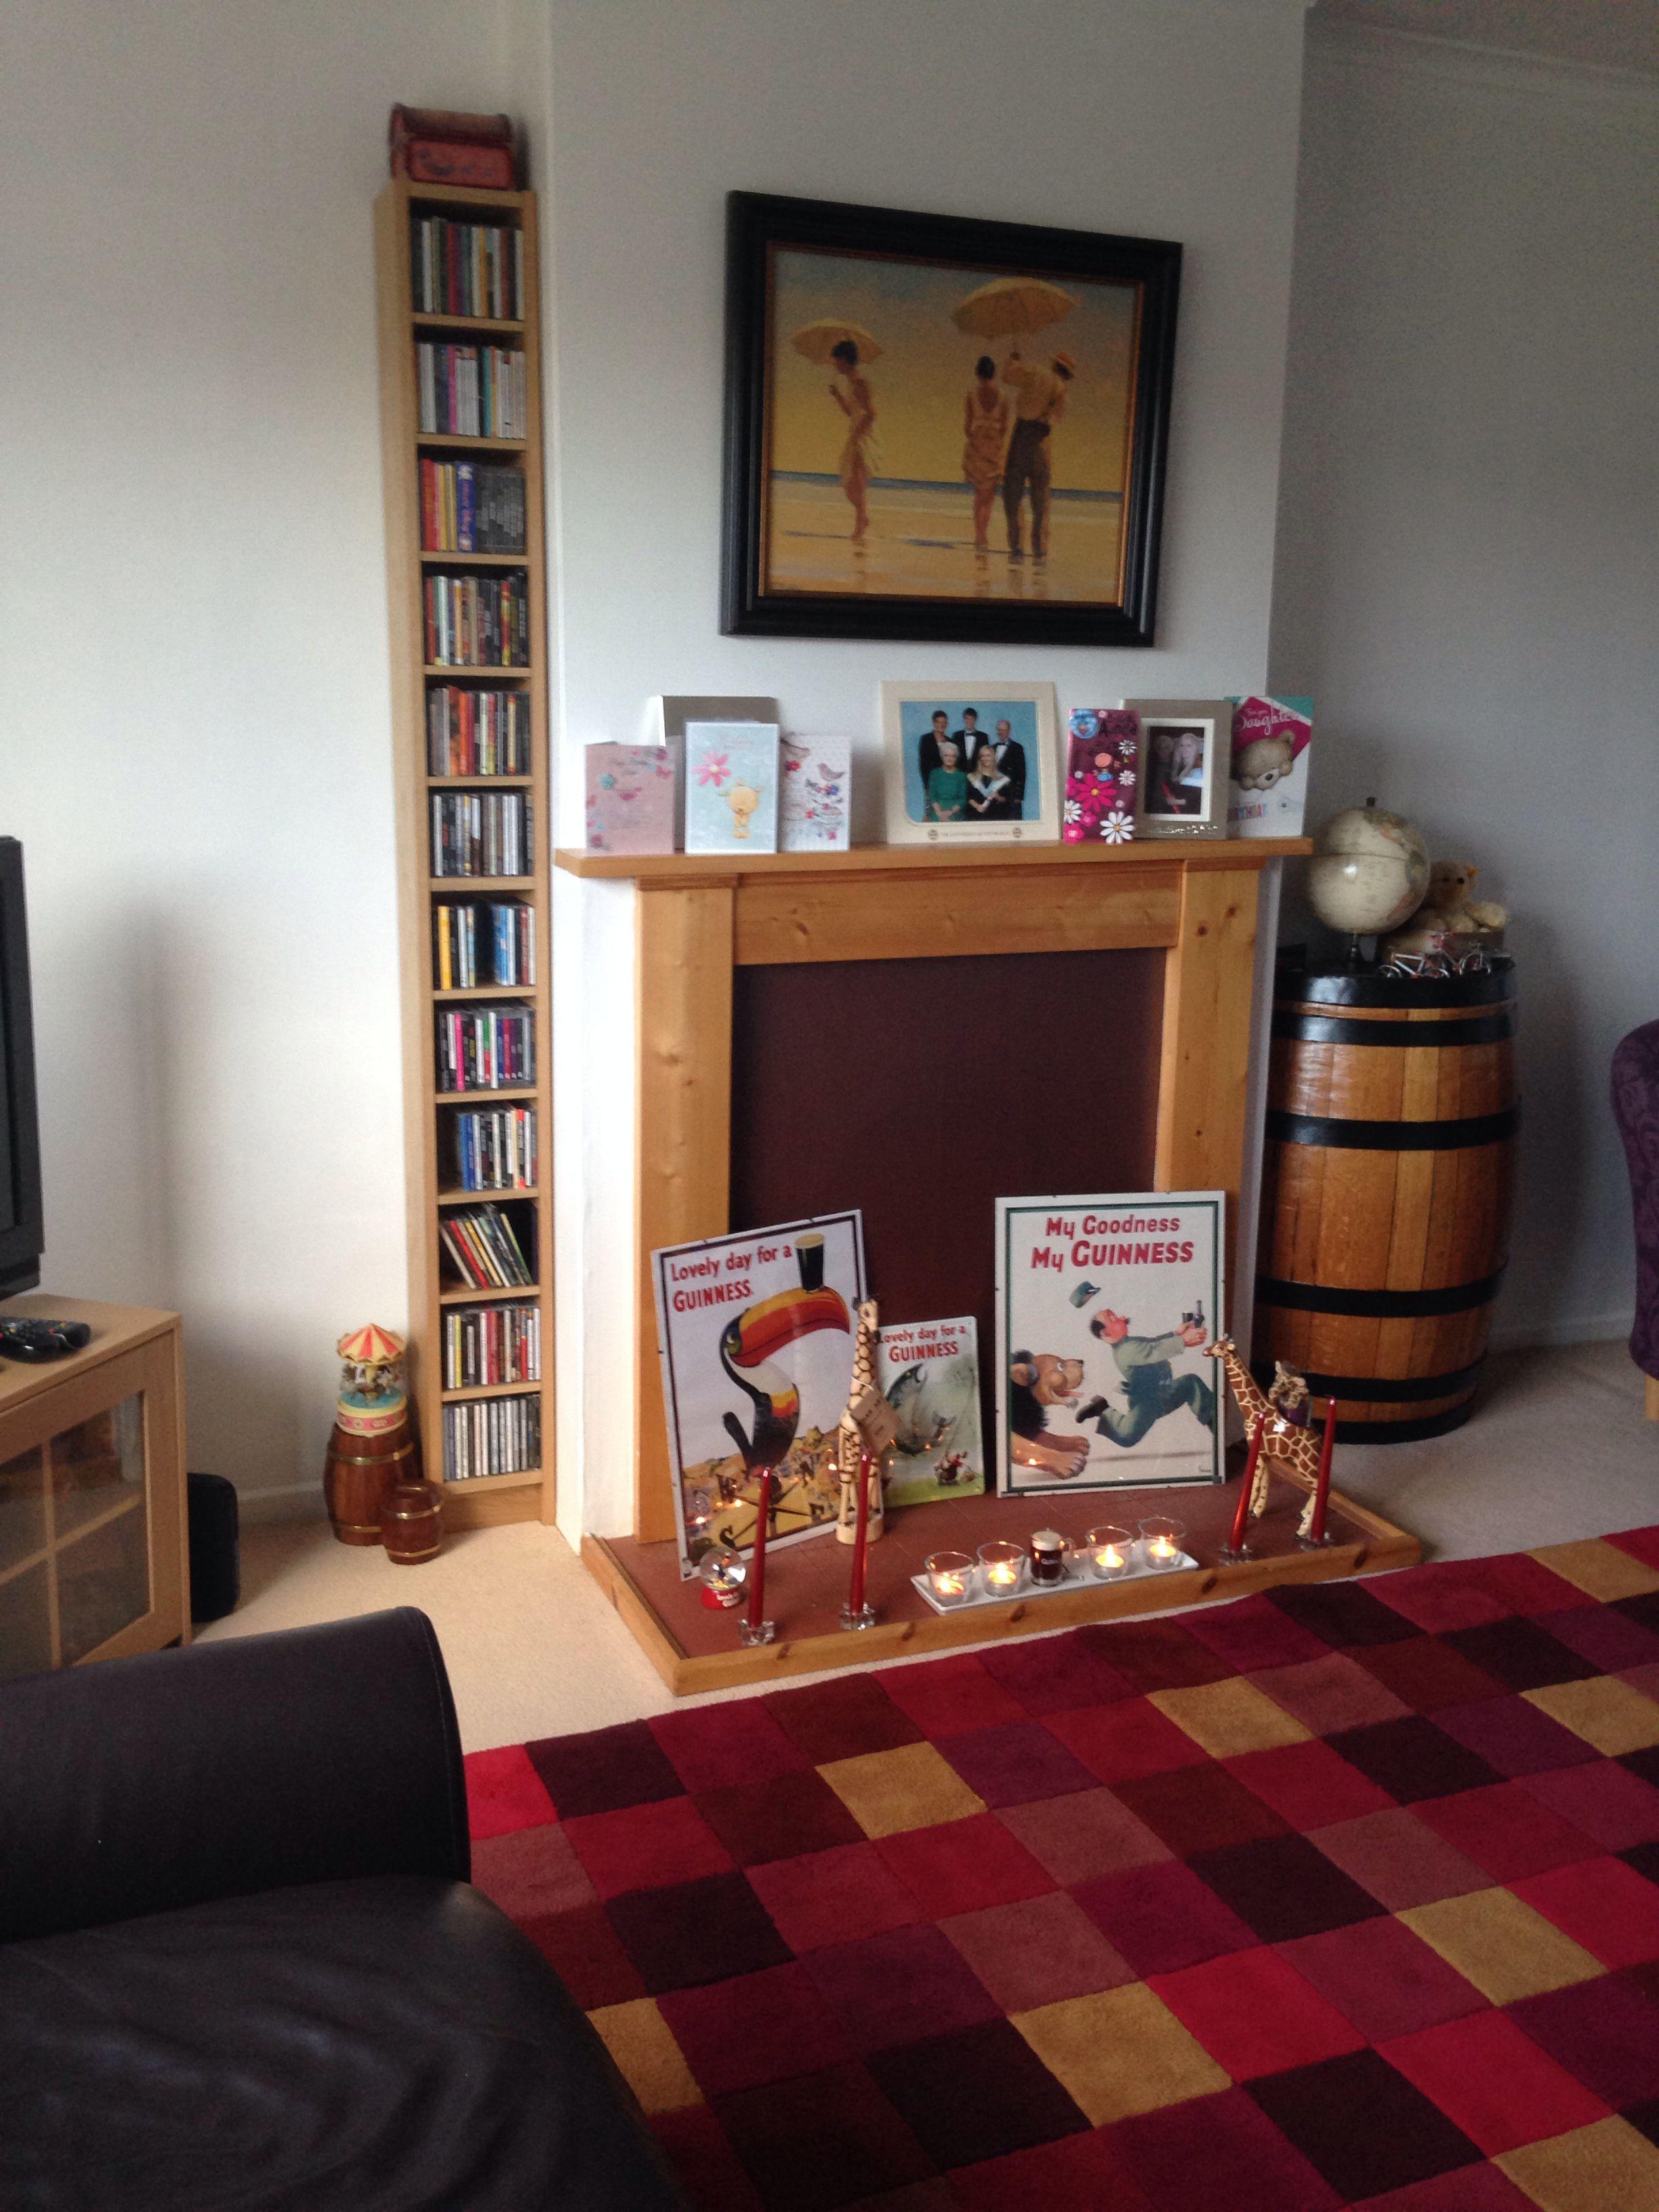 Loft bed with slide kmart  Lovely day for a Guinness  Home Sweet Pineapple Ideas  Pinterest